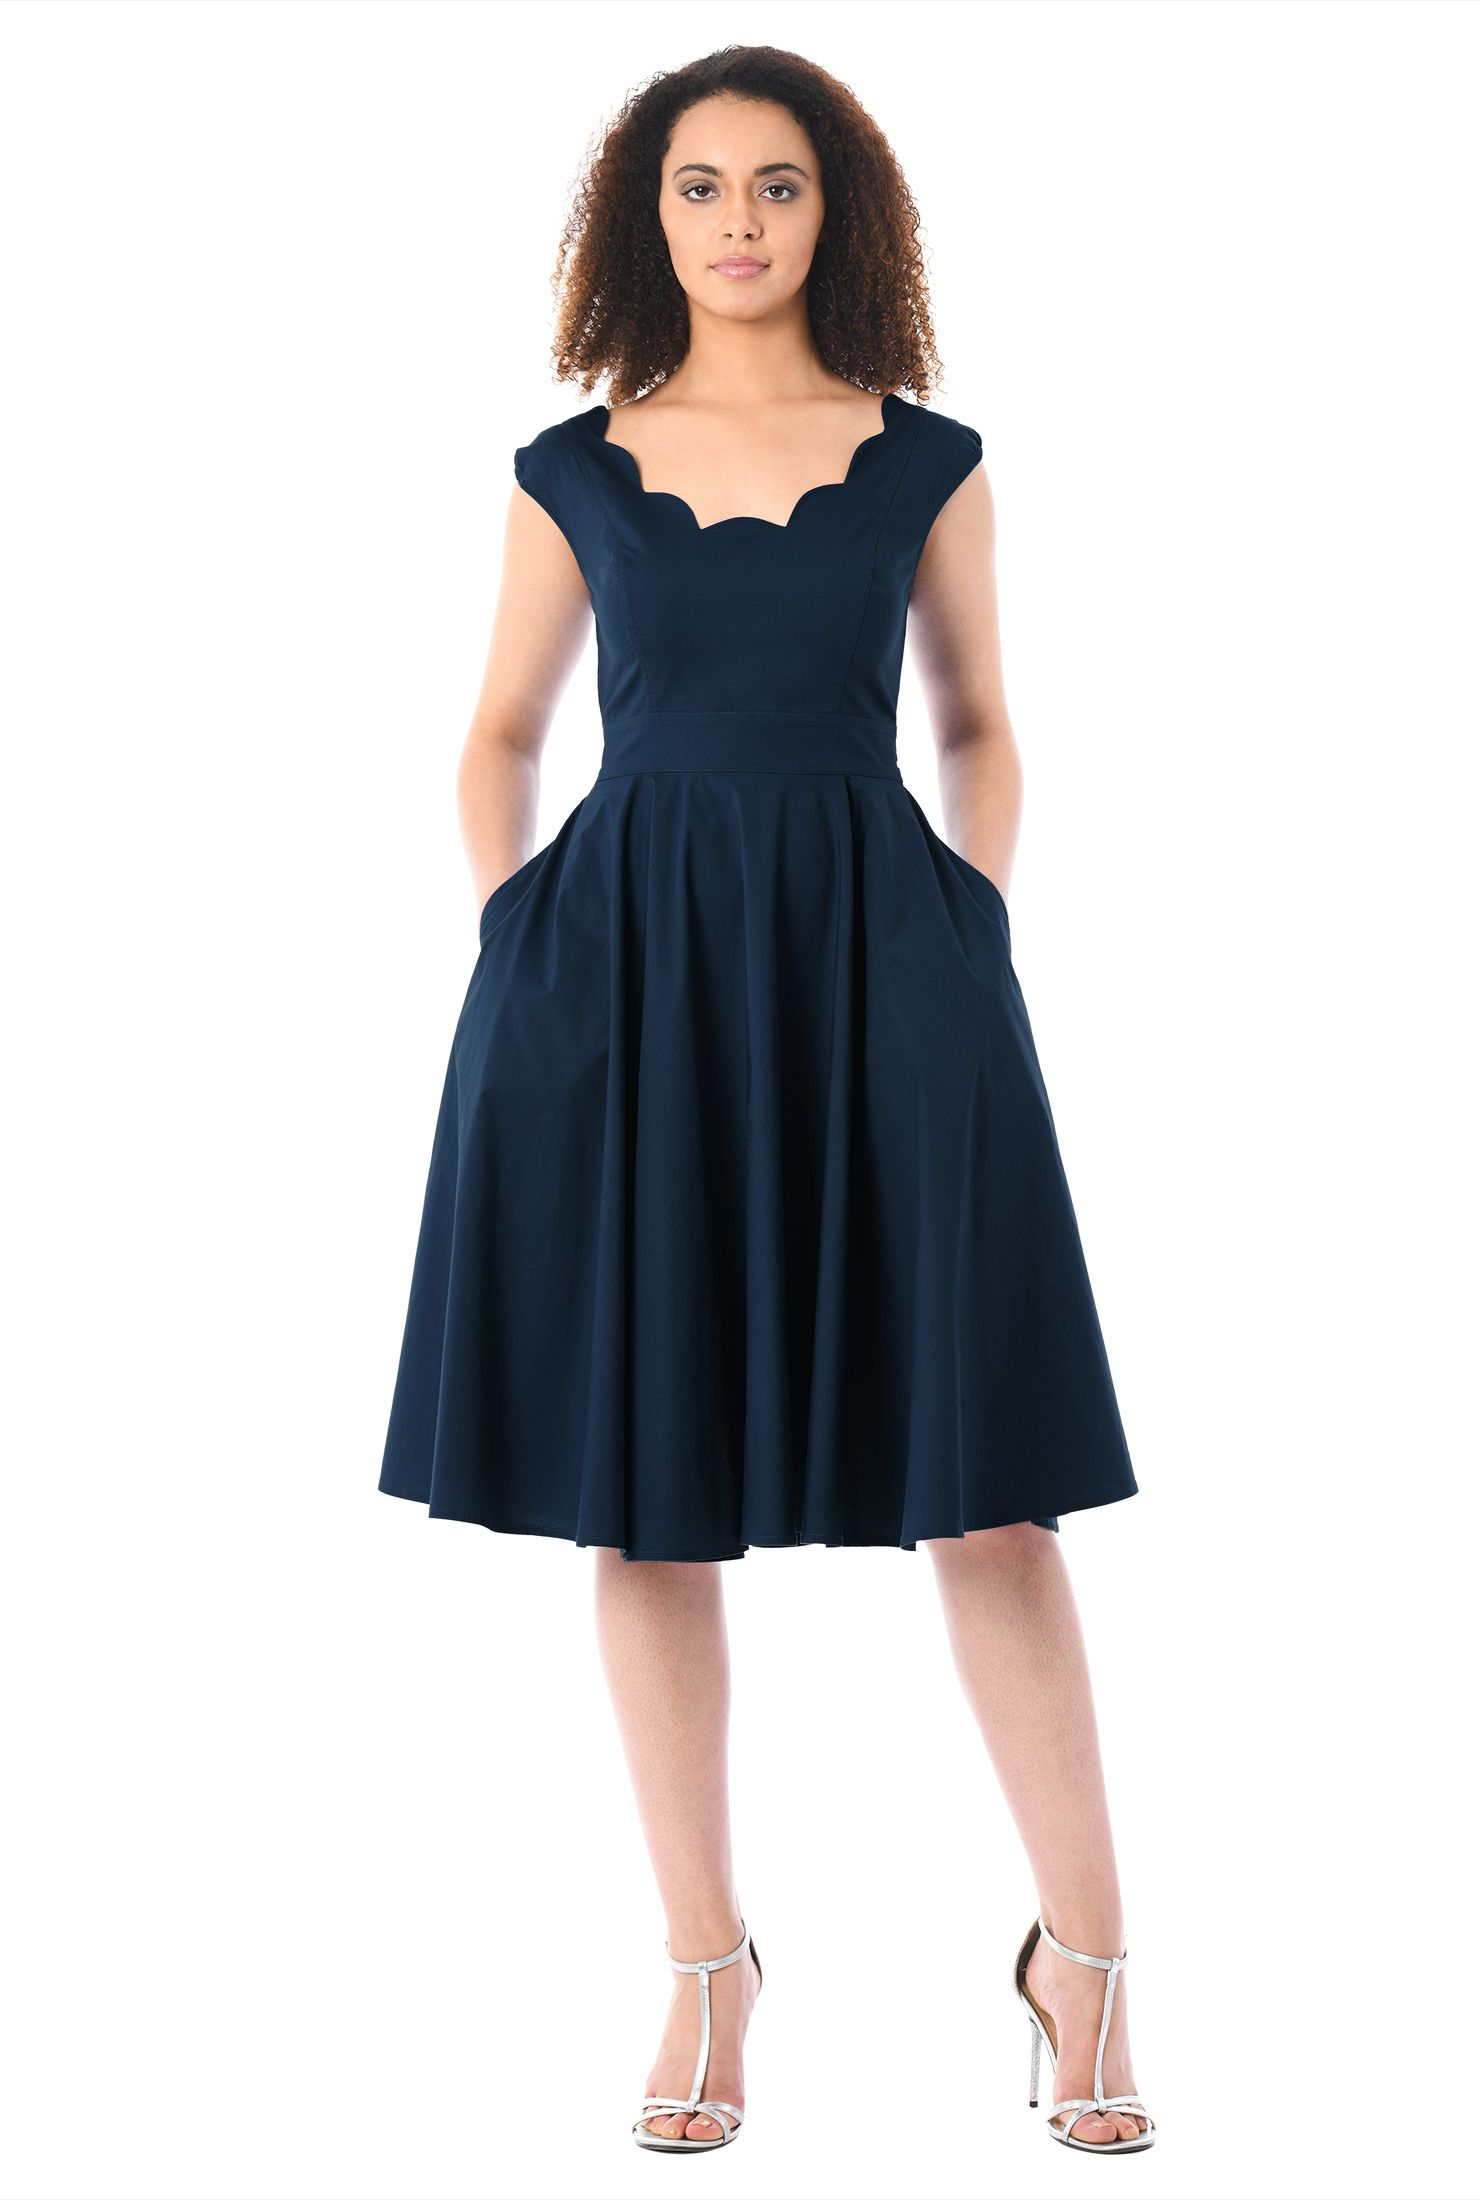 Back zip dresses below knee length dresses bridesmaids dresses